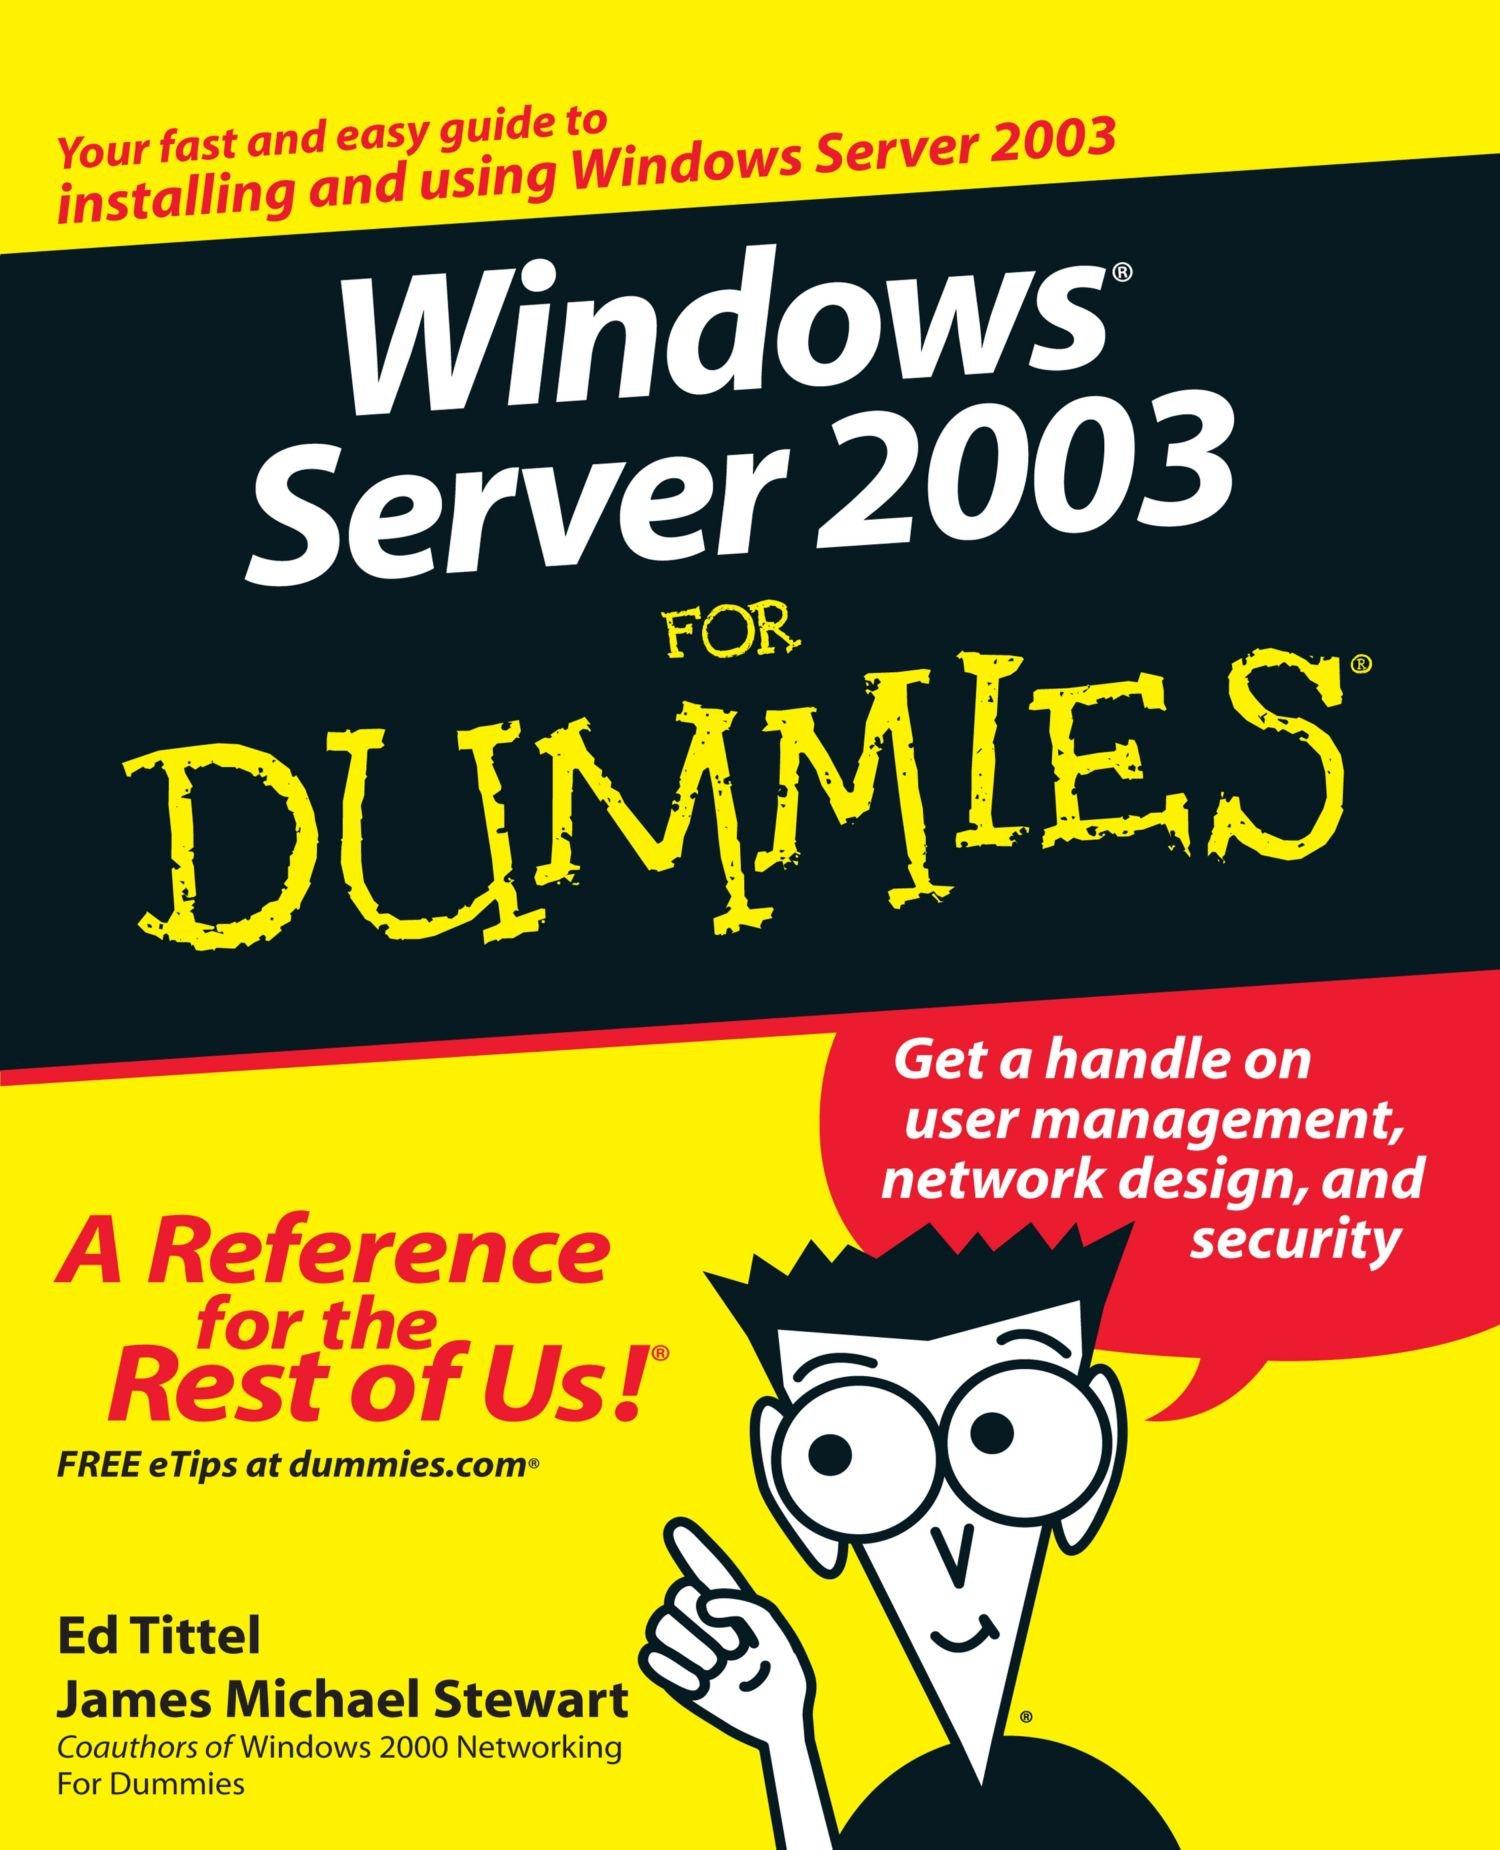 Download Windows Server 2003 For Dummies ebook